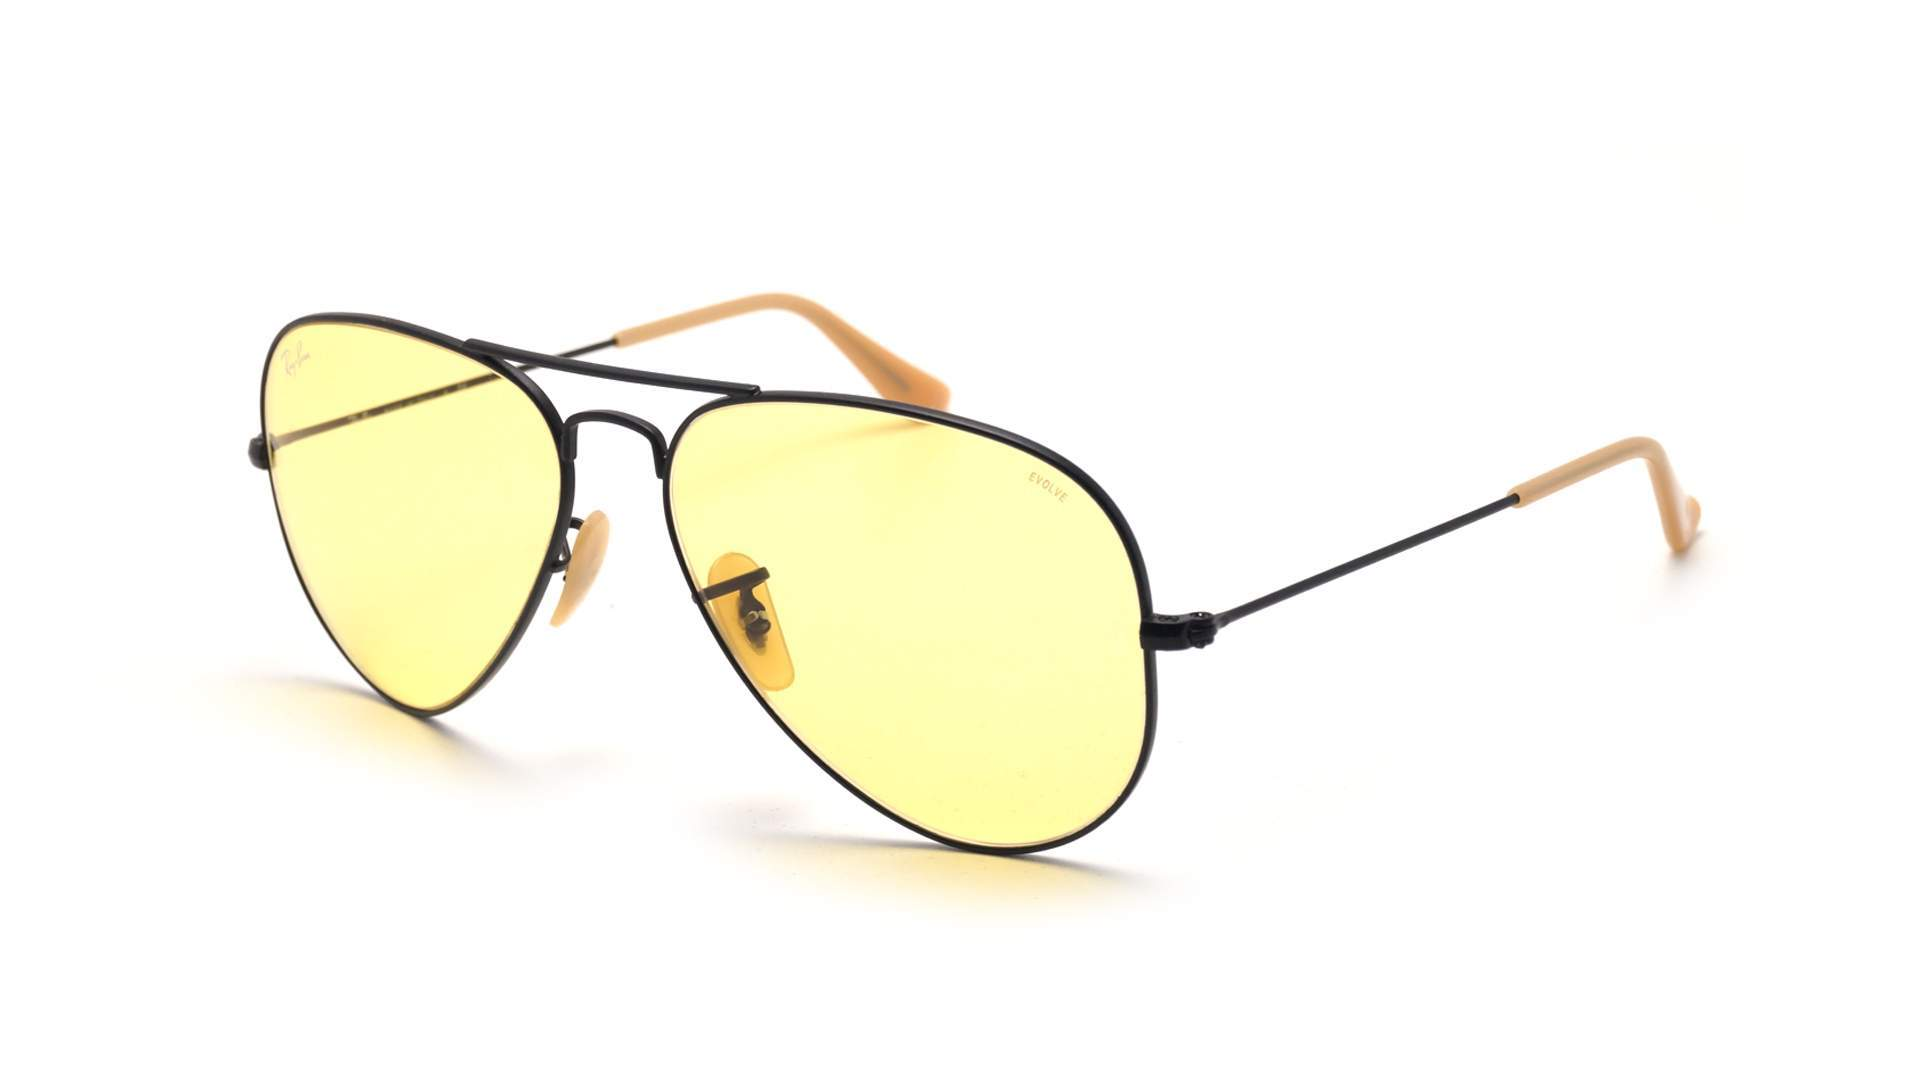 8c78ec39d Sunglasses Ray-Ban Aviator Evolve Black Matte RB3025 9066/4A 55-14 Small  Photochromic